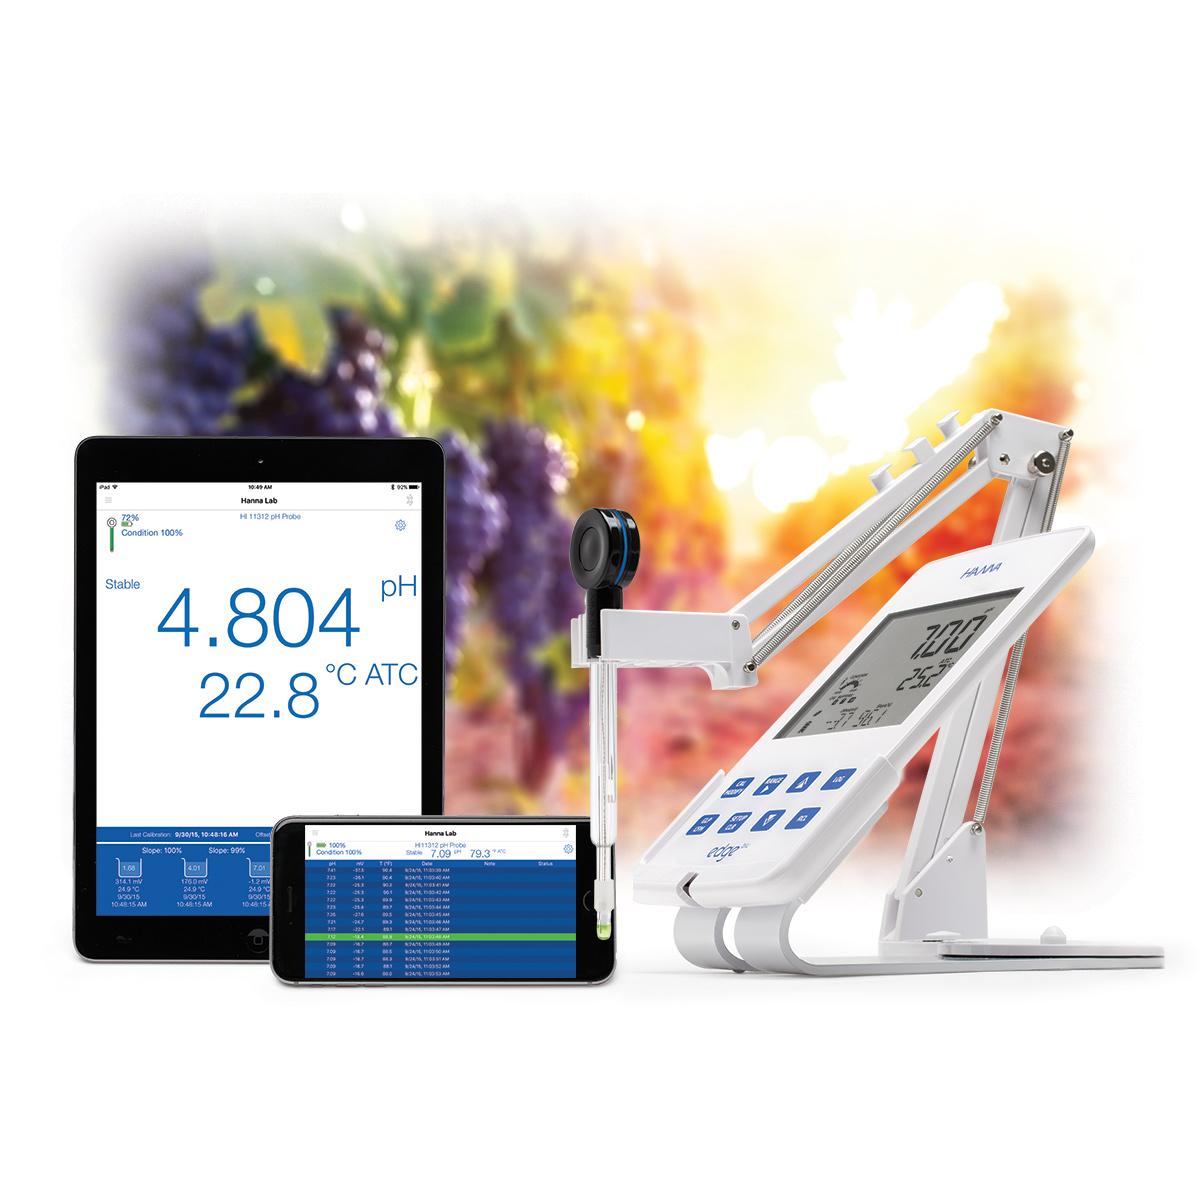 الکترود بلوتوثی ارزان پی اچ قابل اتصال به تلفن همراه